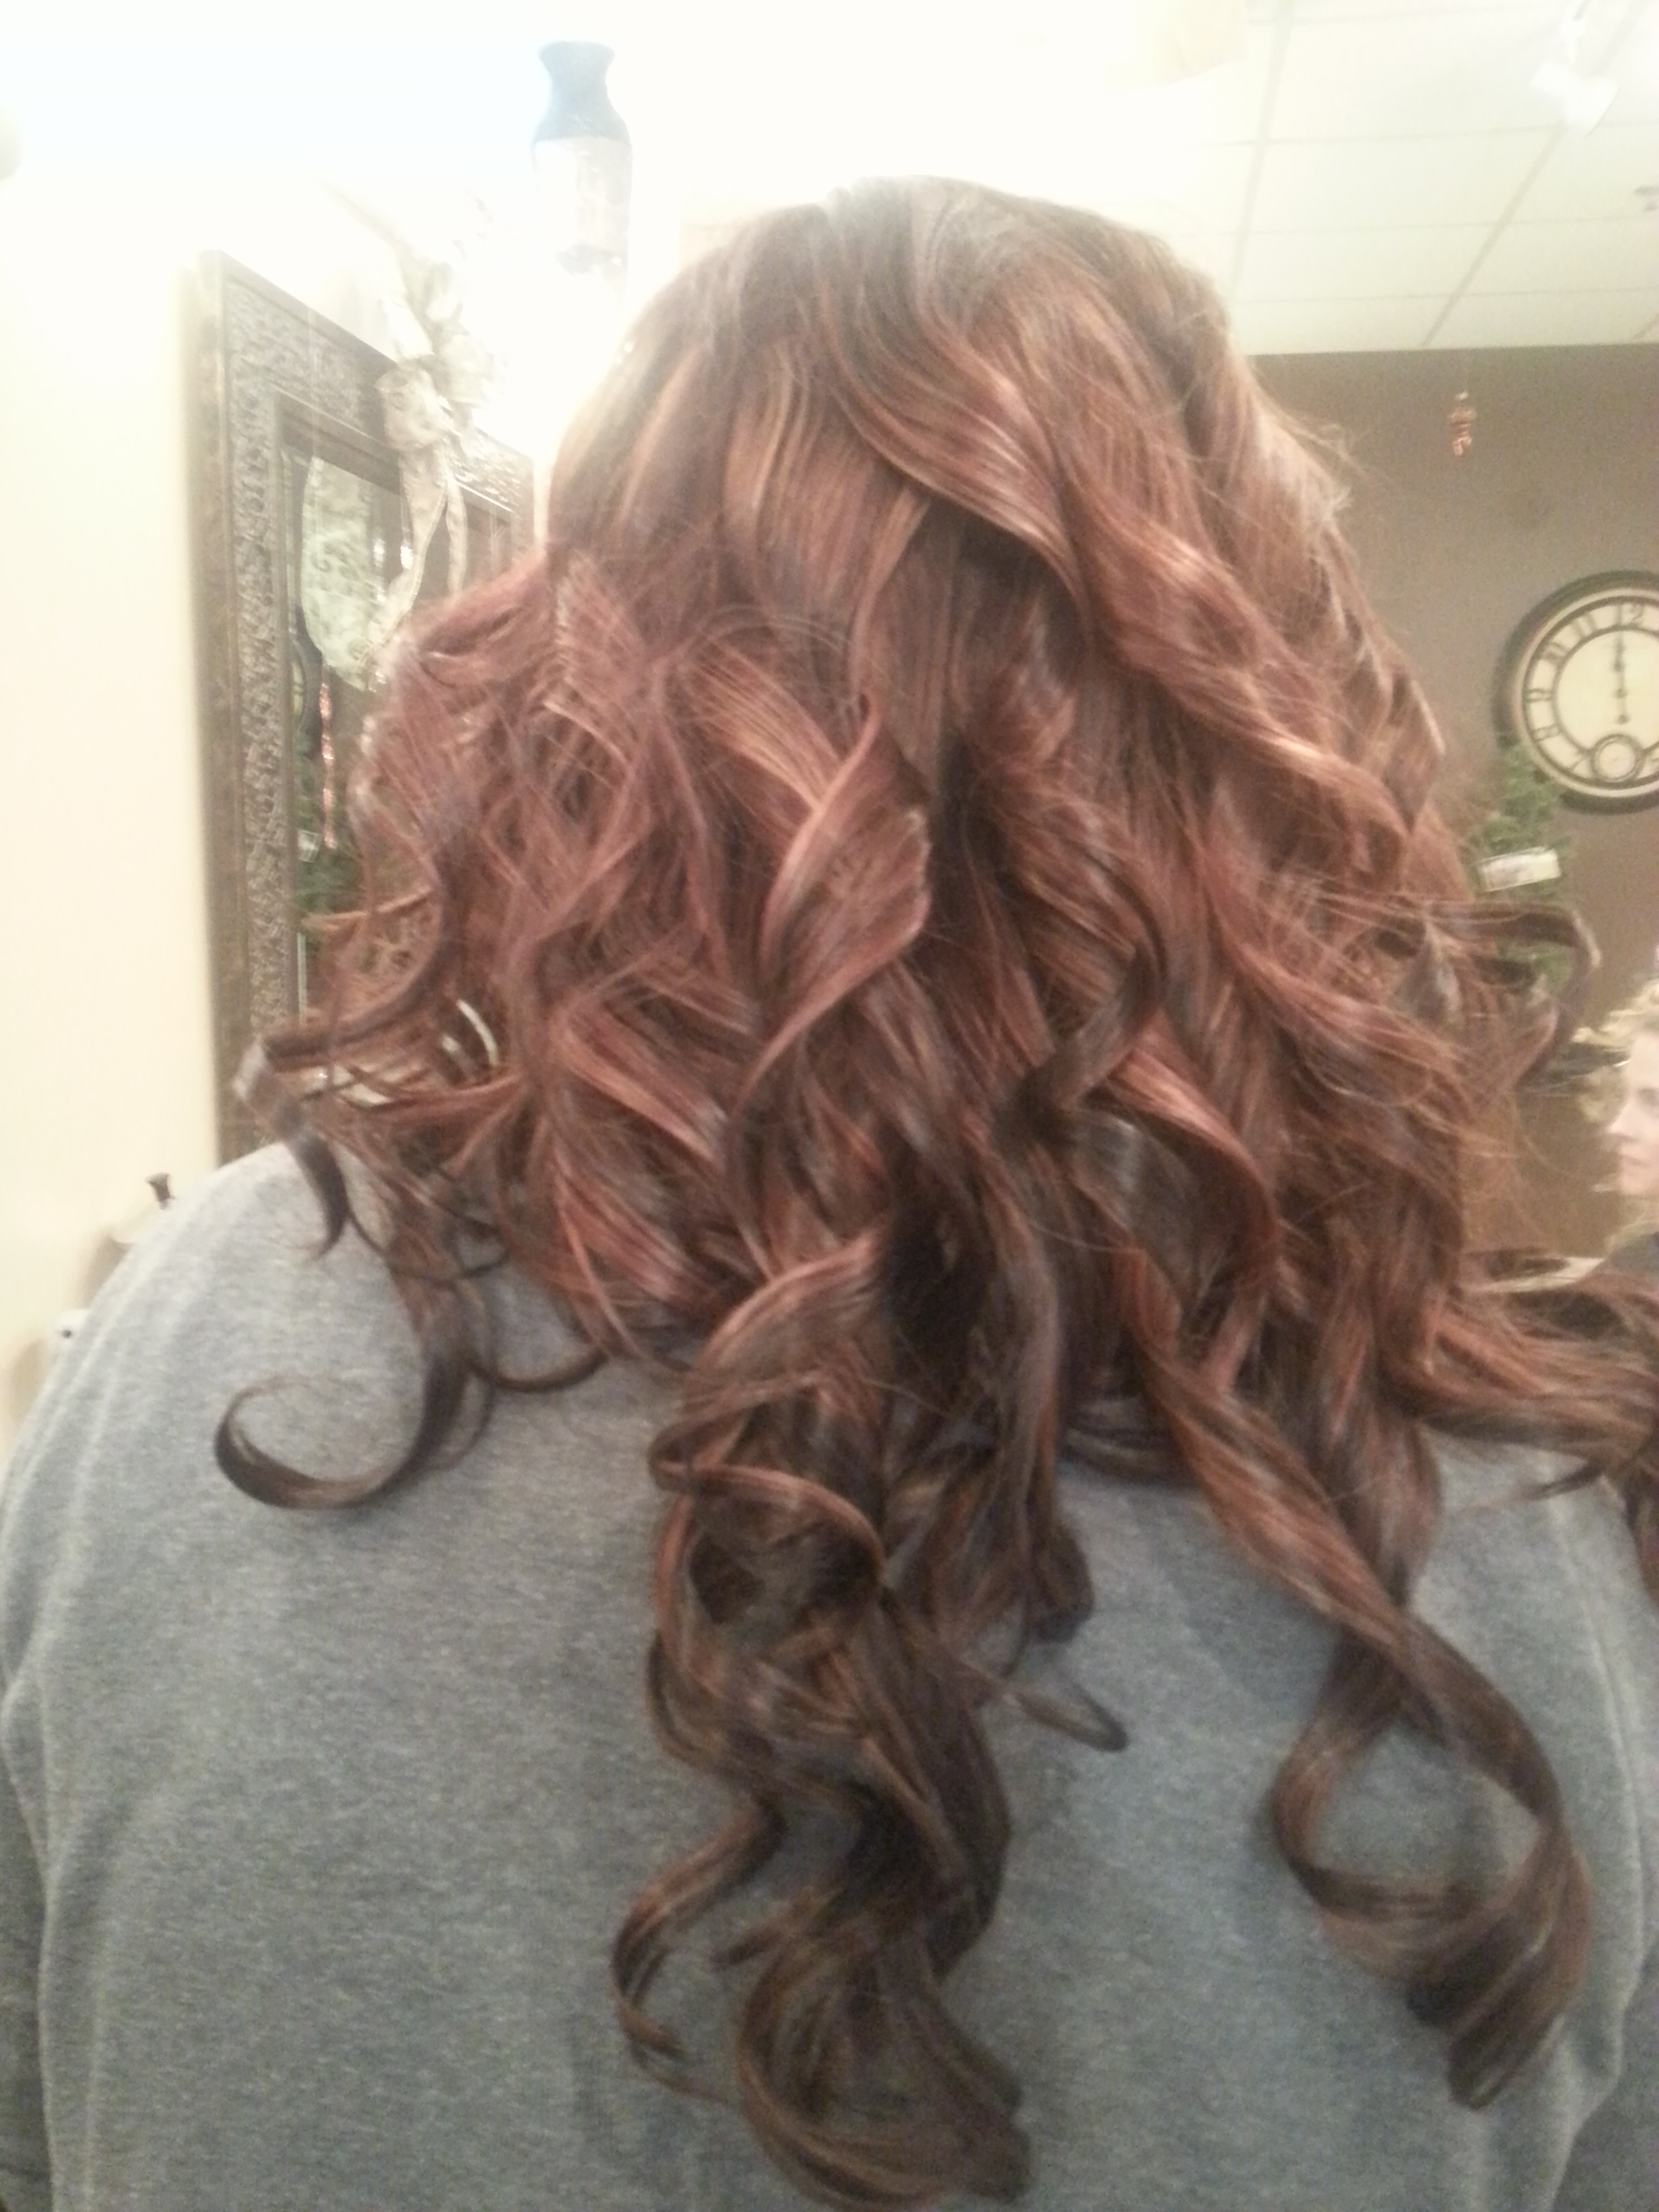 Soft Curls by Susanne